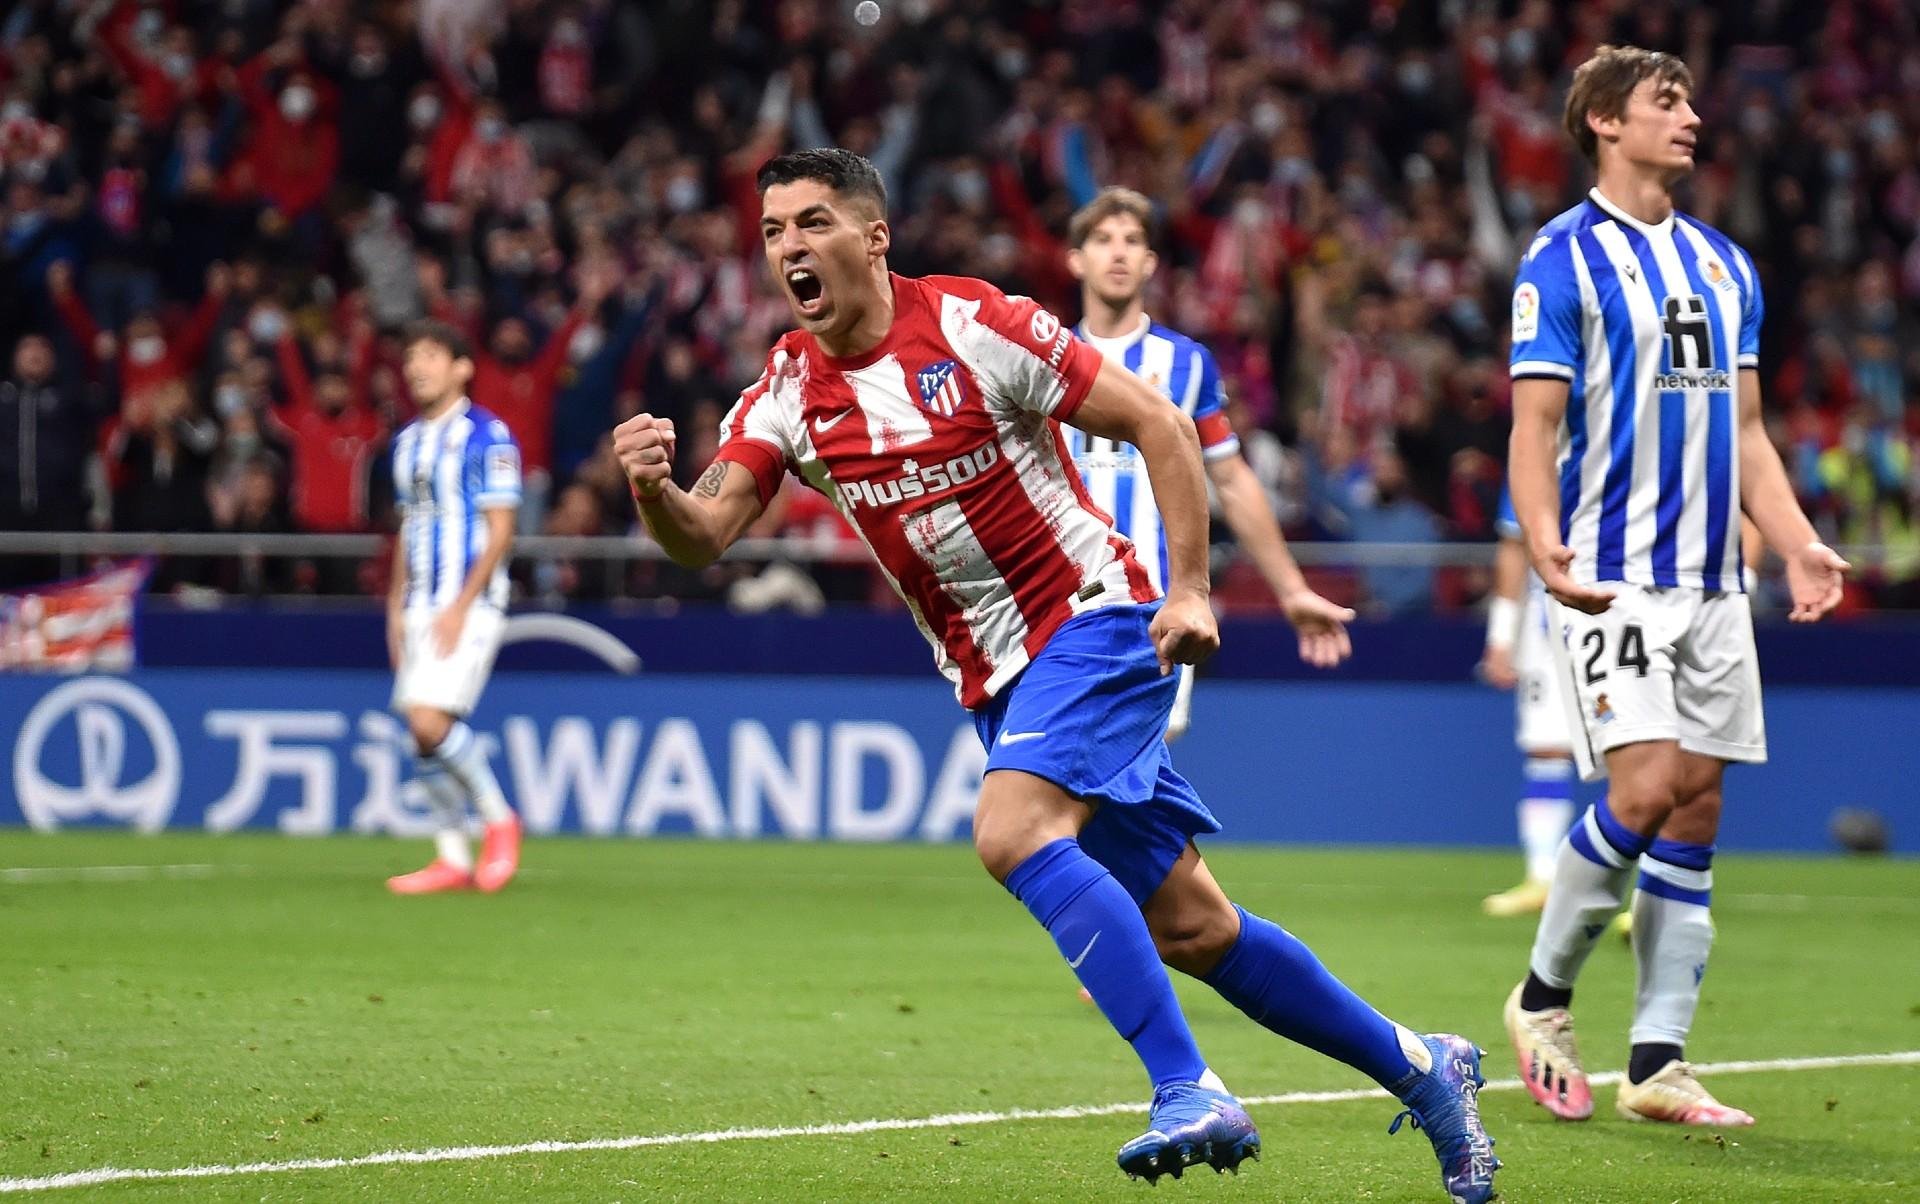 Luis Suarez rescues Atletico Madrid draw against Real Sociedad